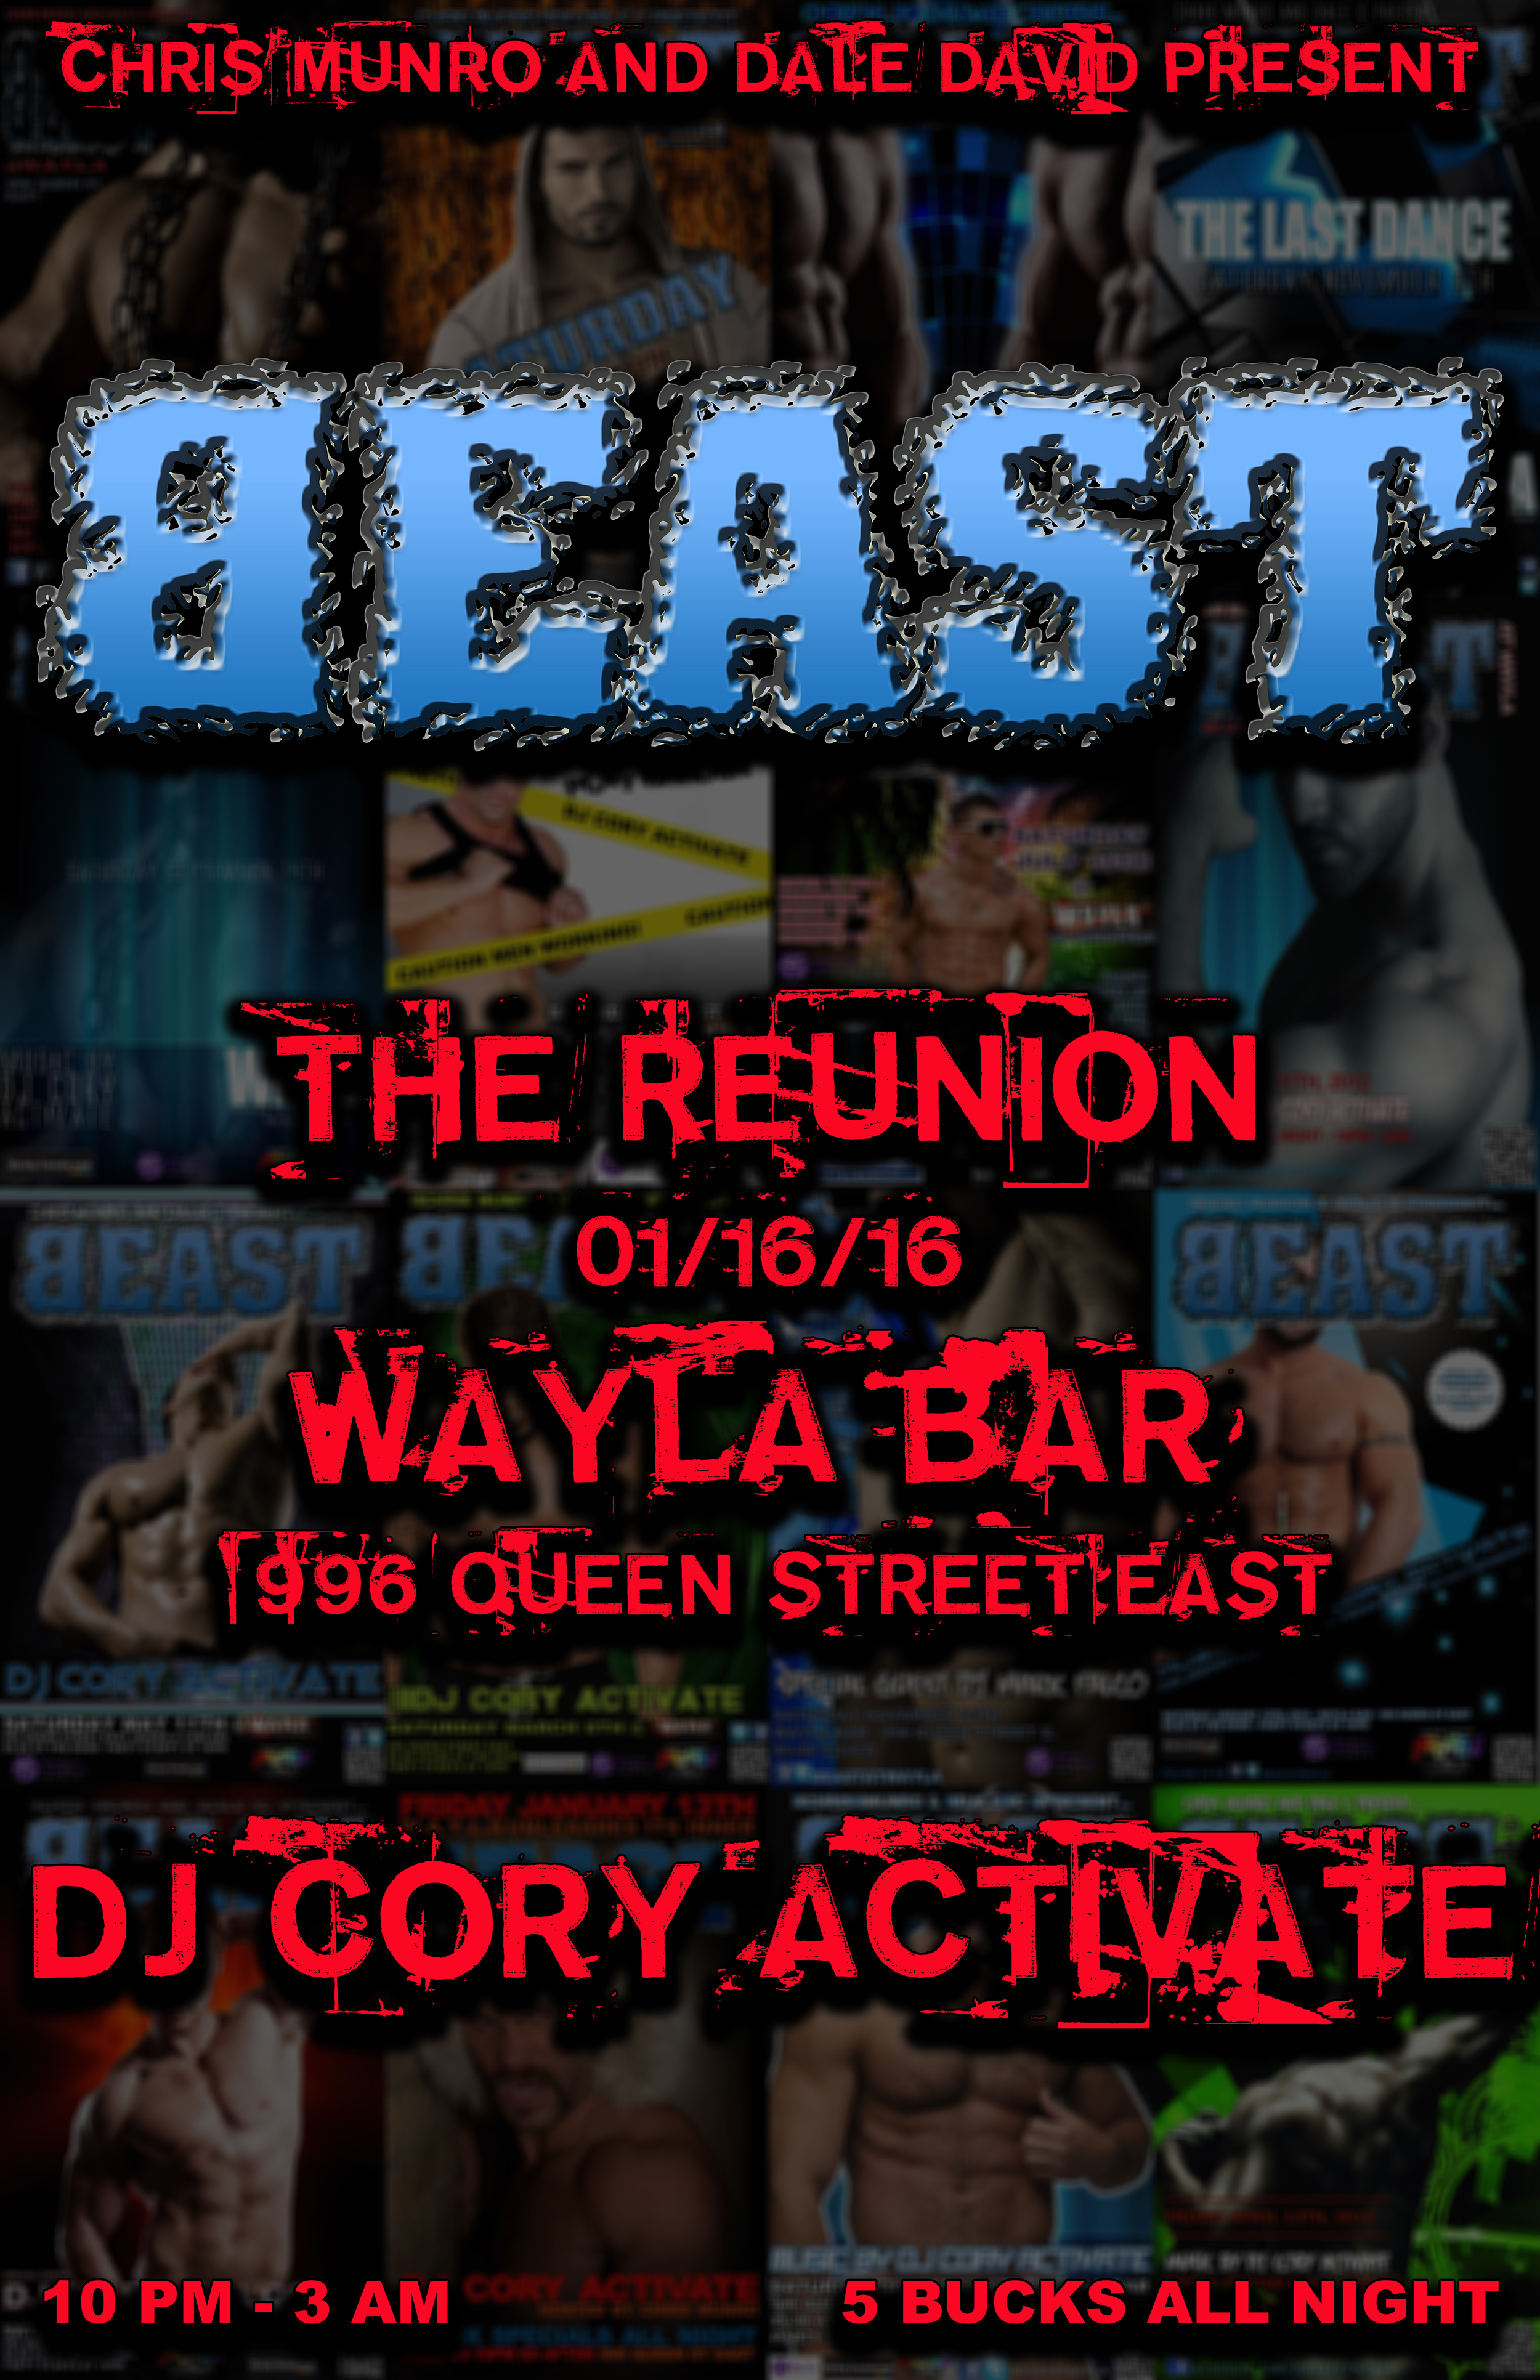 B-east... The reunion